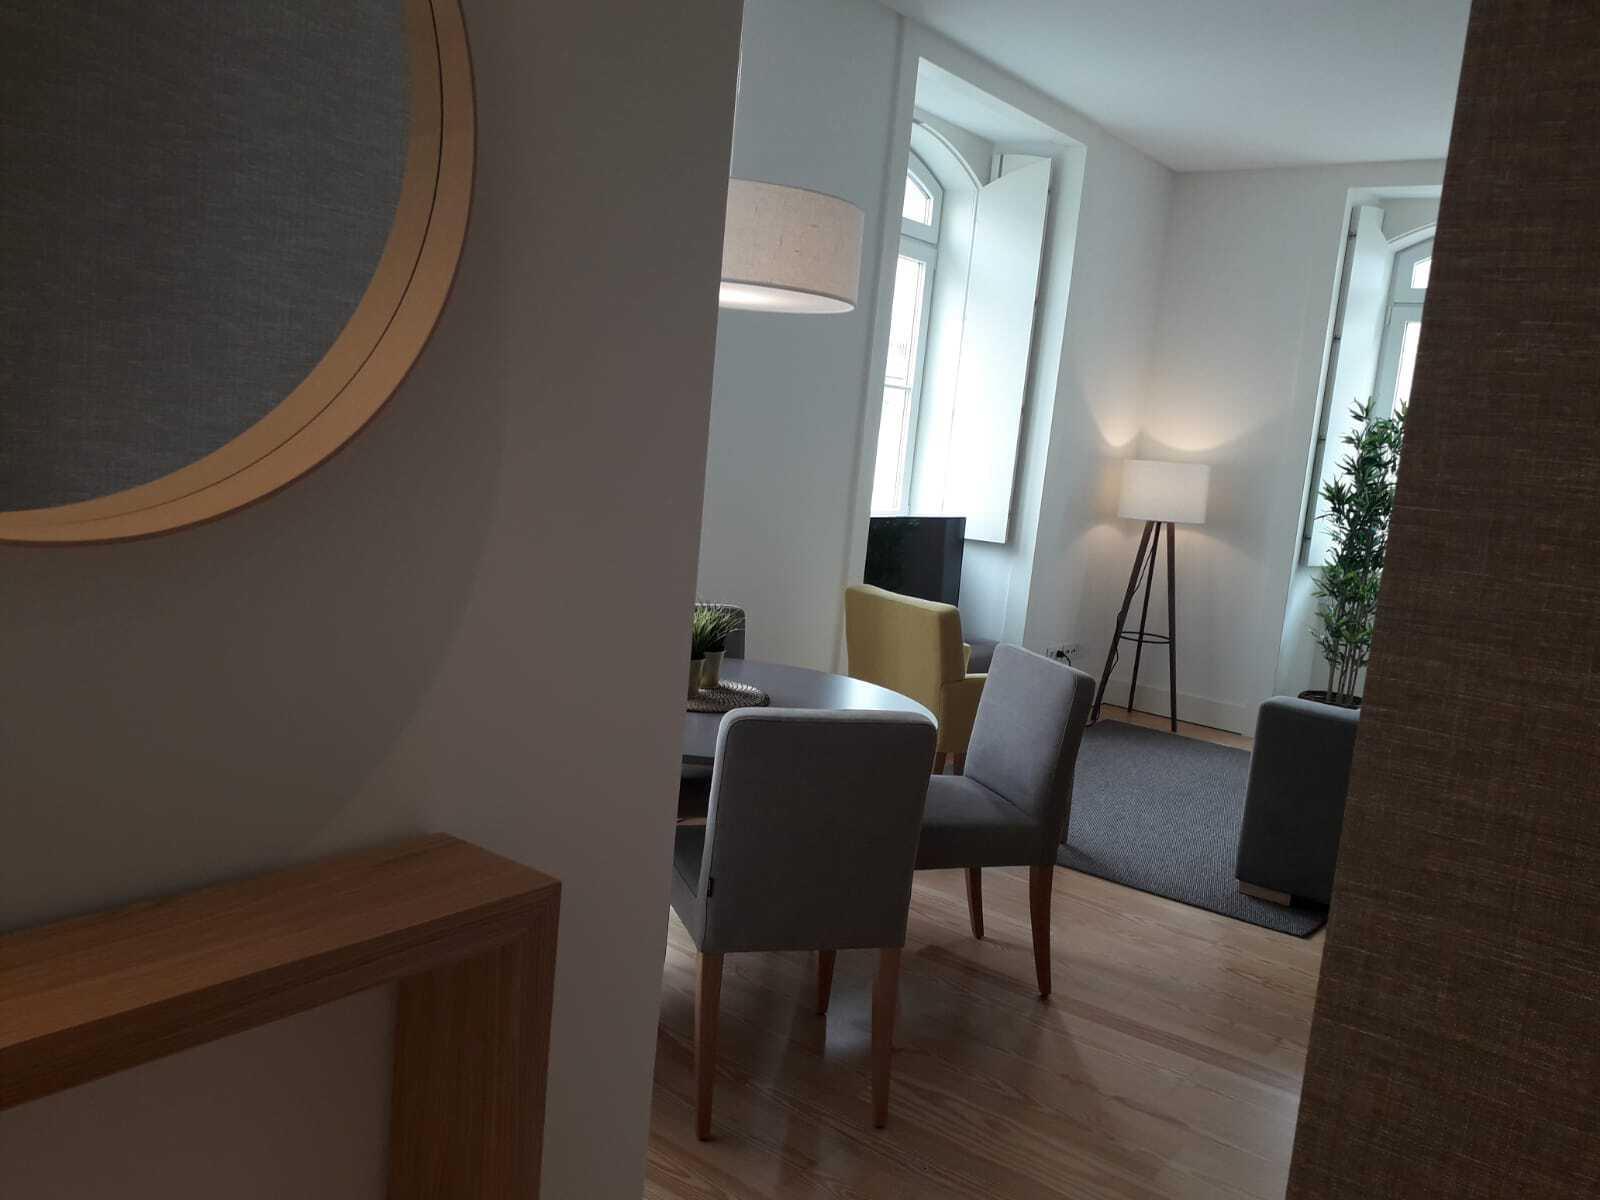 pf17866-apartamento-t1-lisboa-6d8eb6ec-ea26-4715-ae38-9eac69f86186